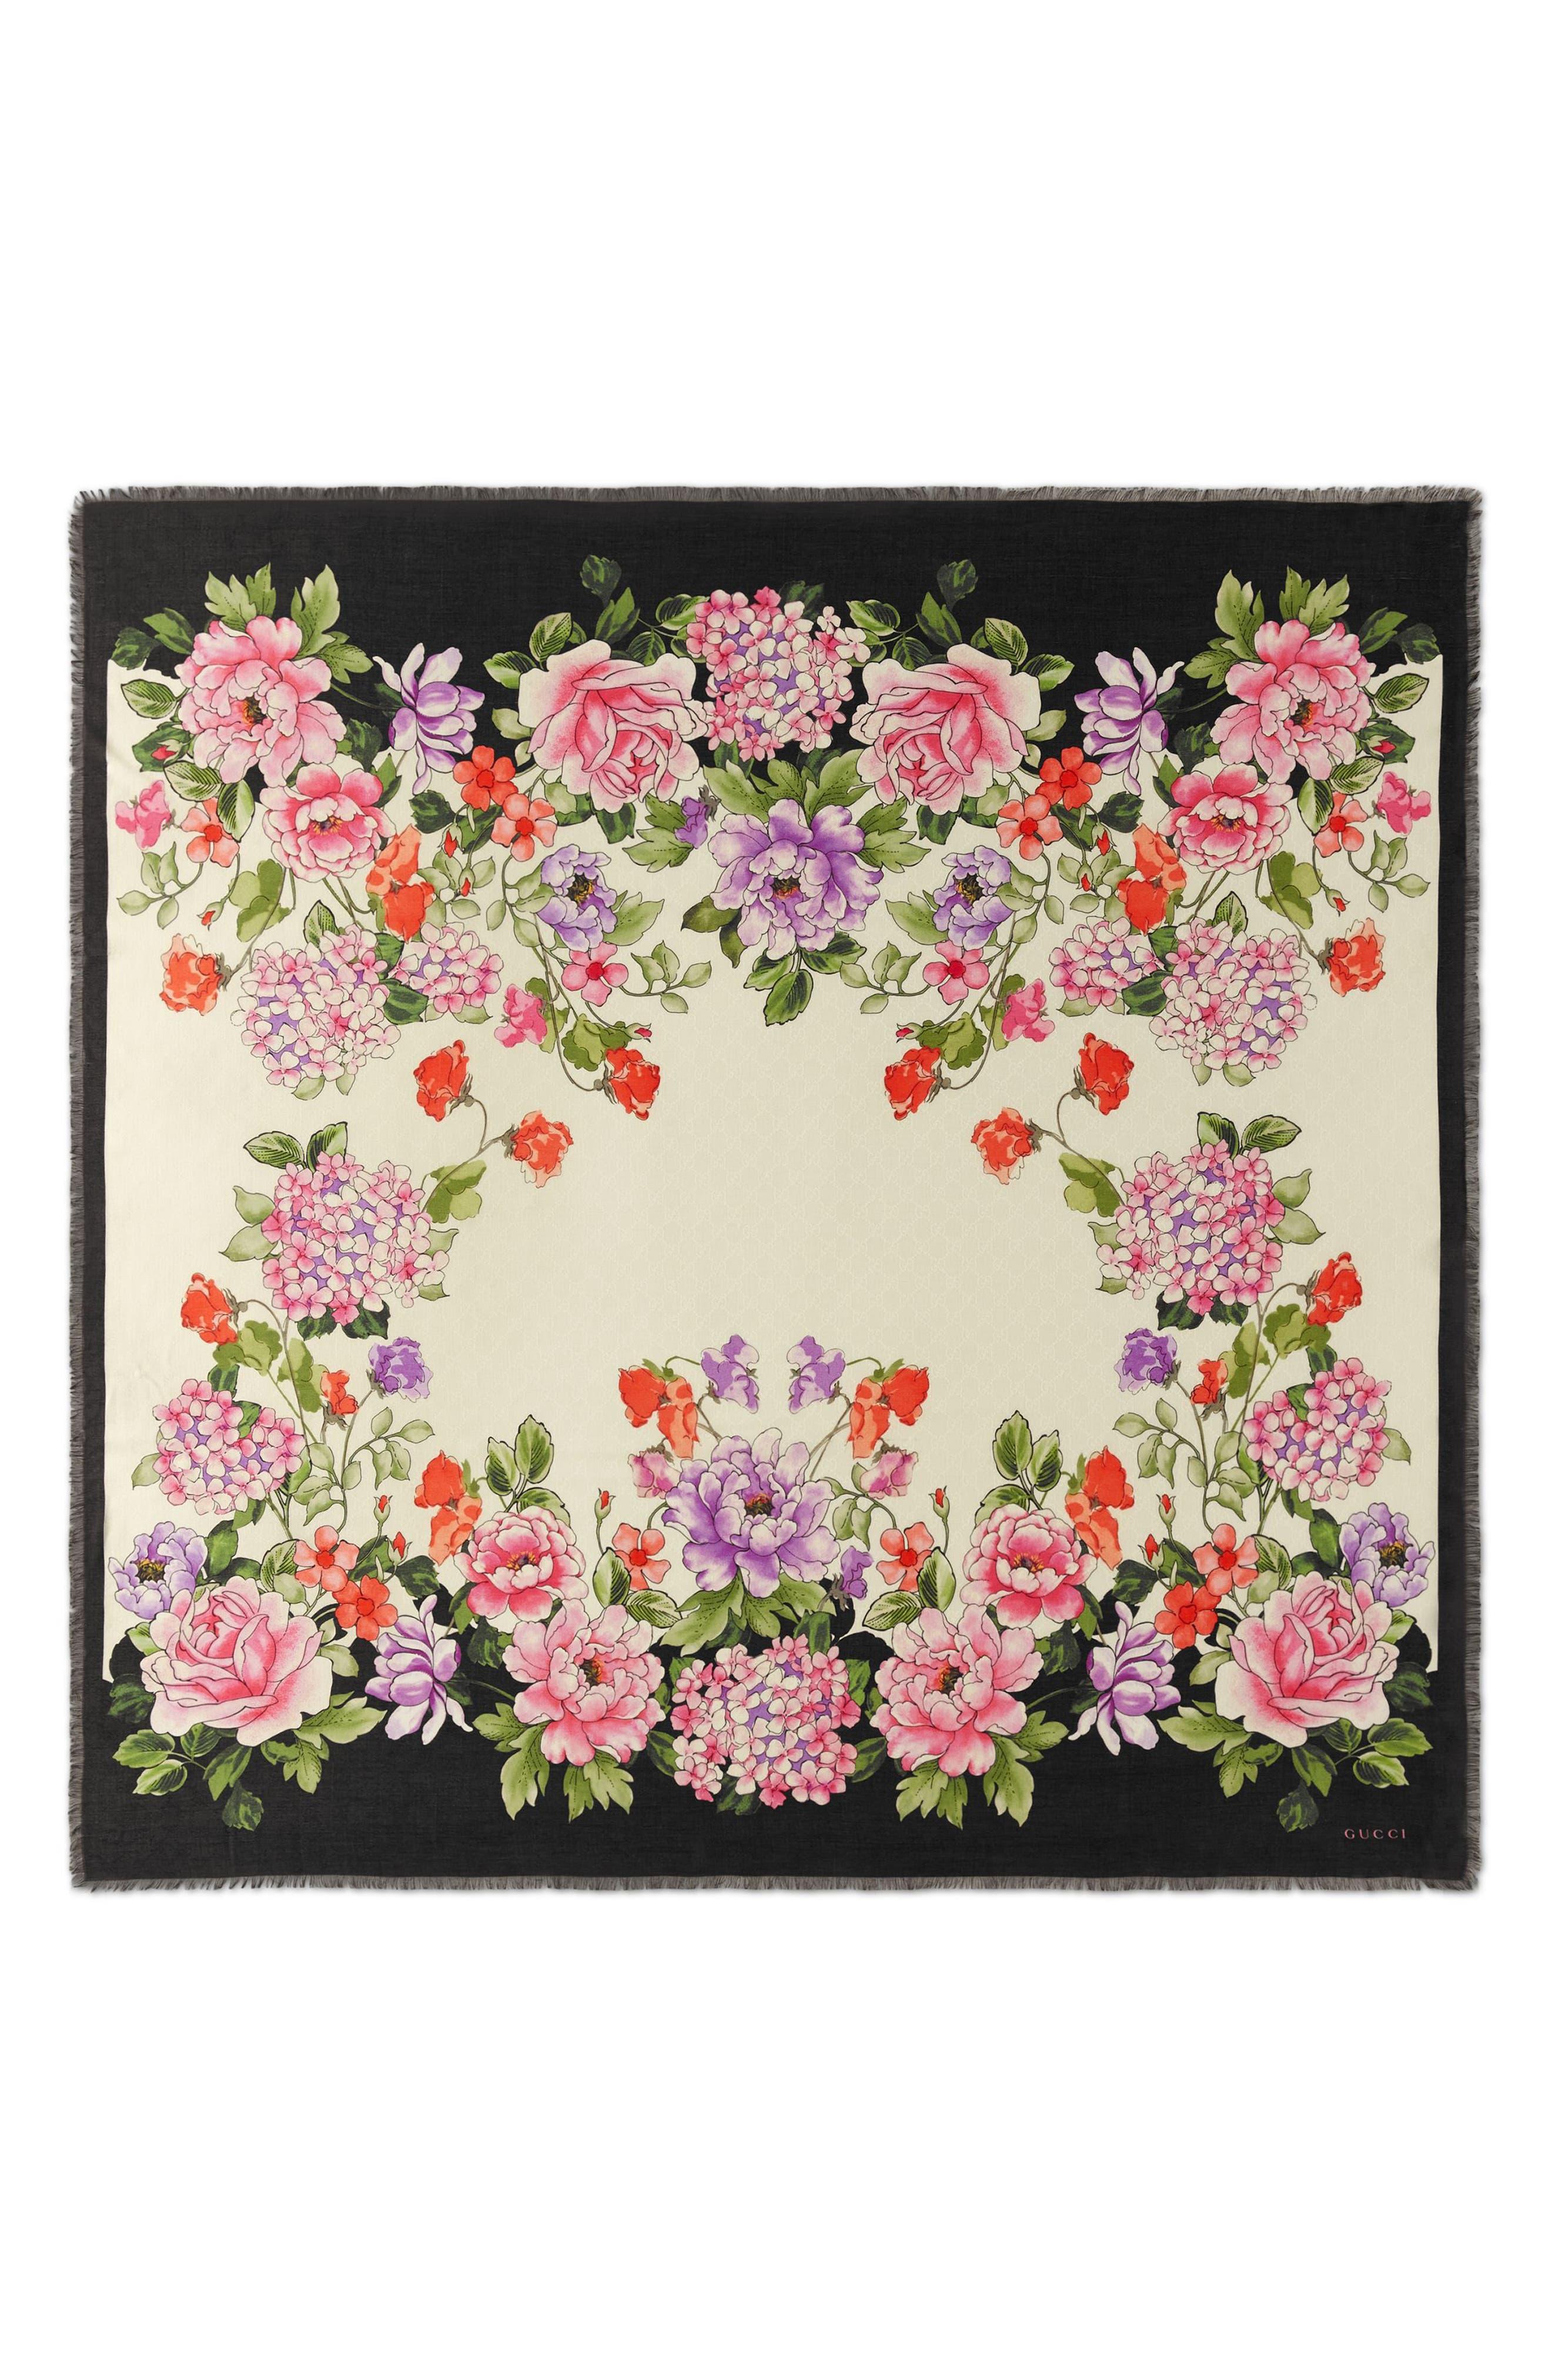 GUCCI,                             Rising Flowers Square Shawl,                             Main thumbnail 1, color,                             IVORY/ BLACK